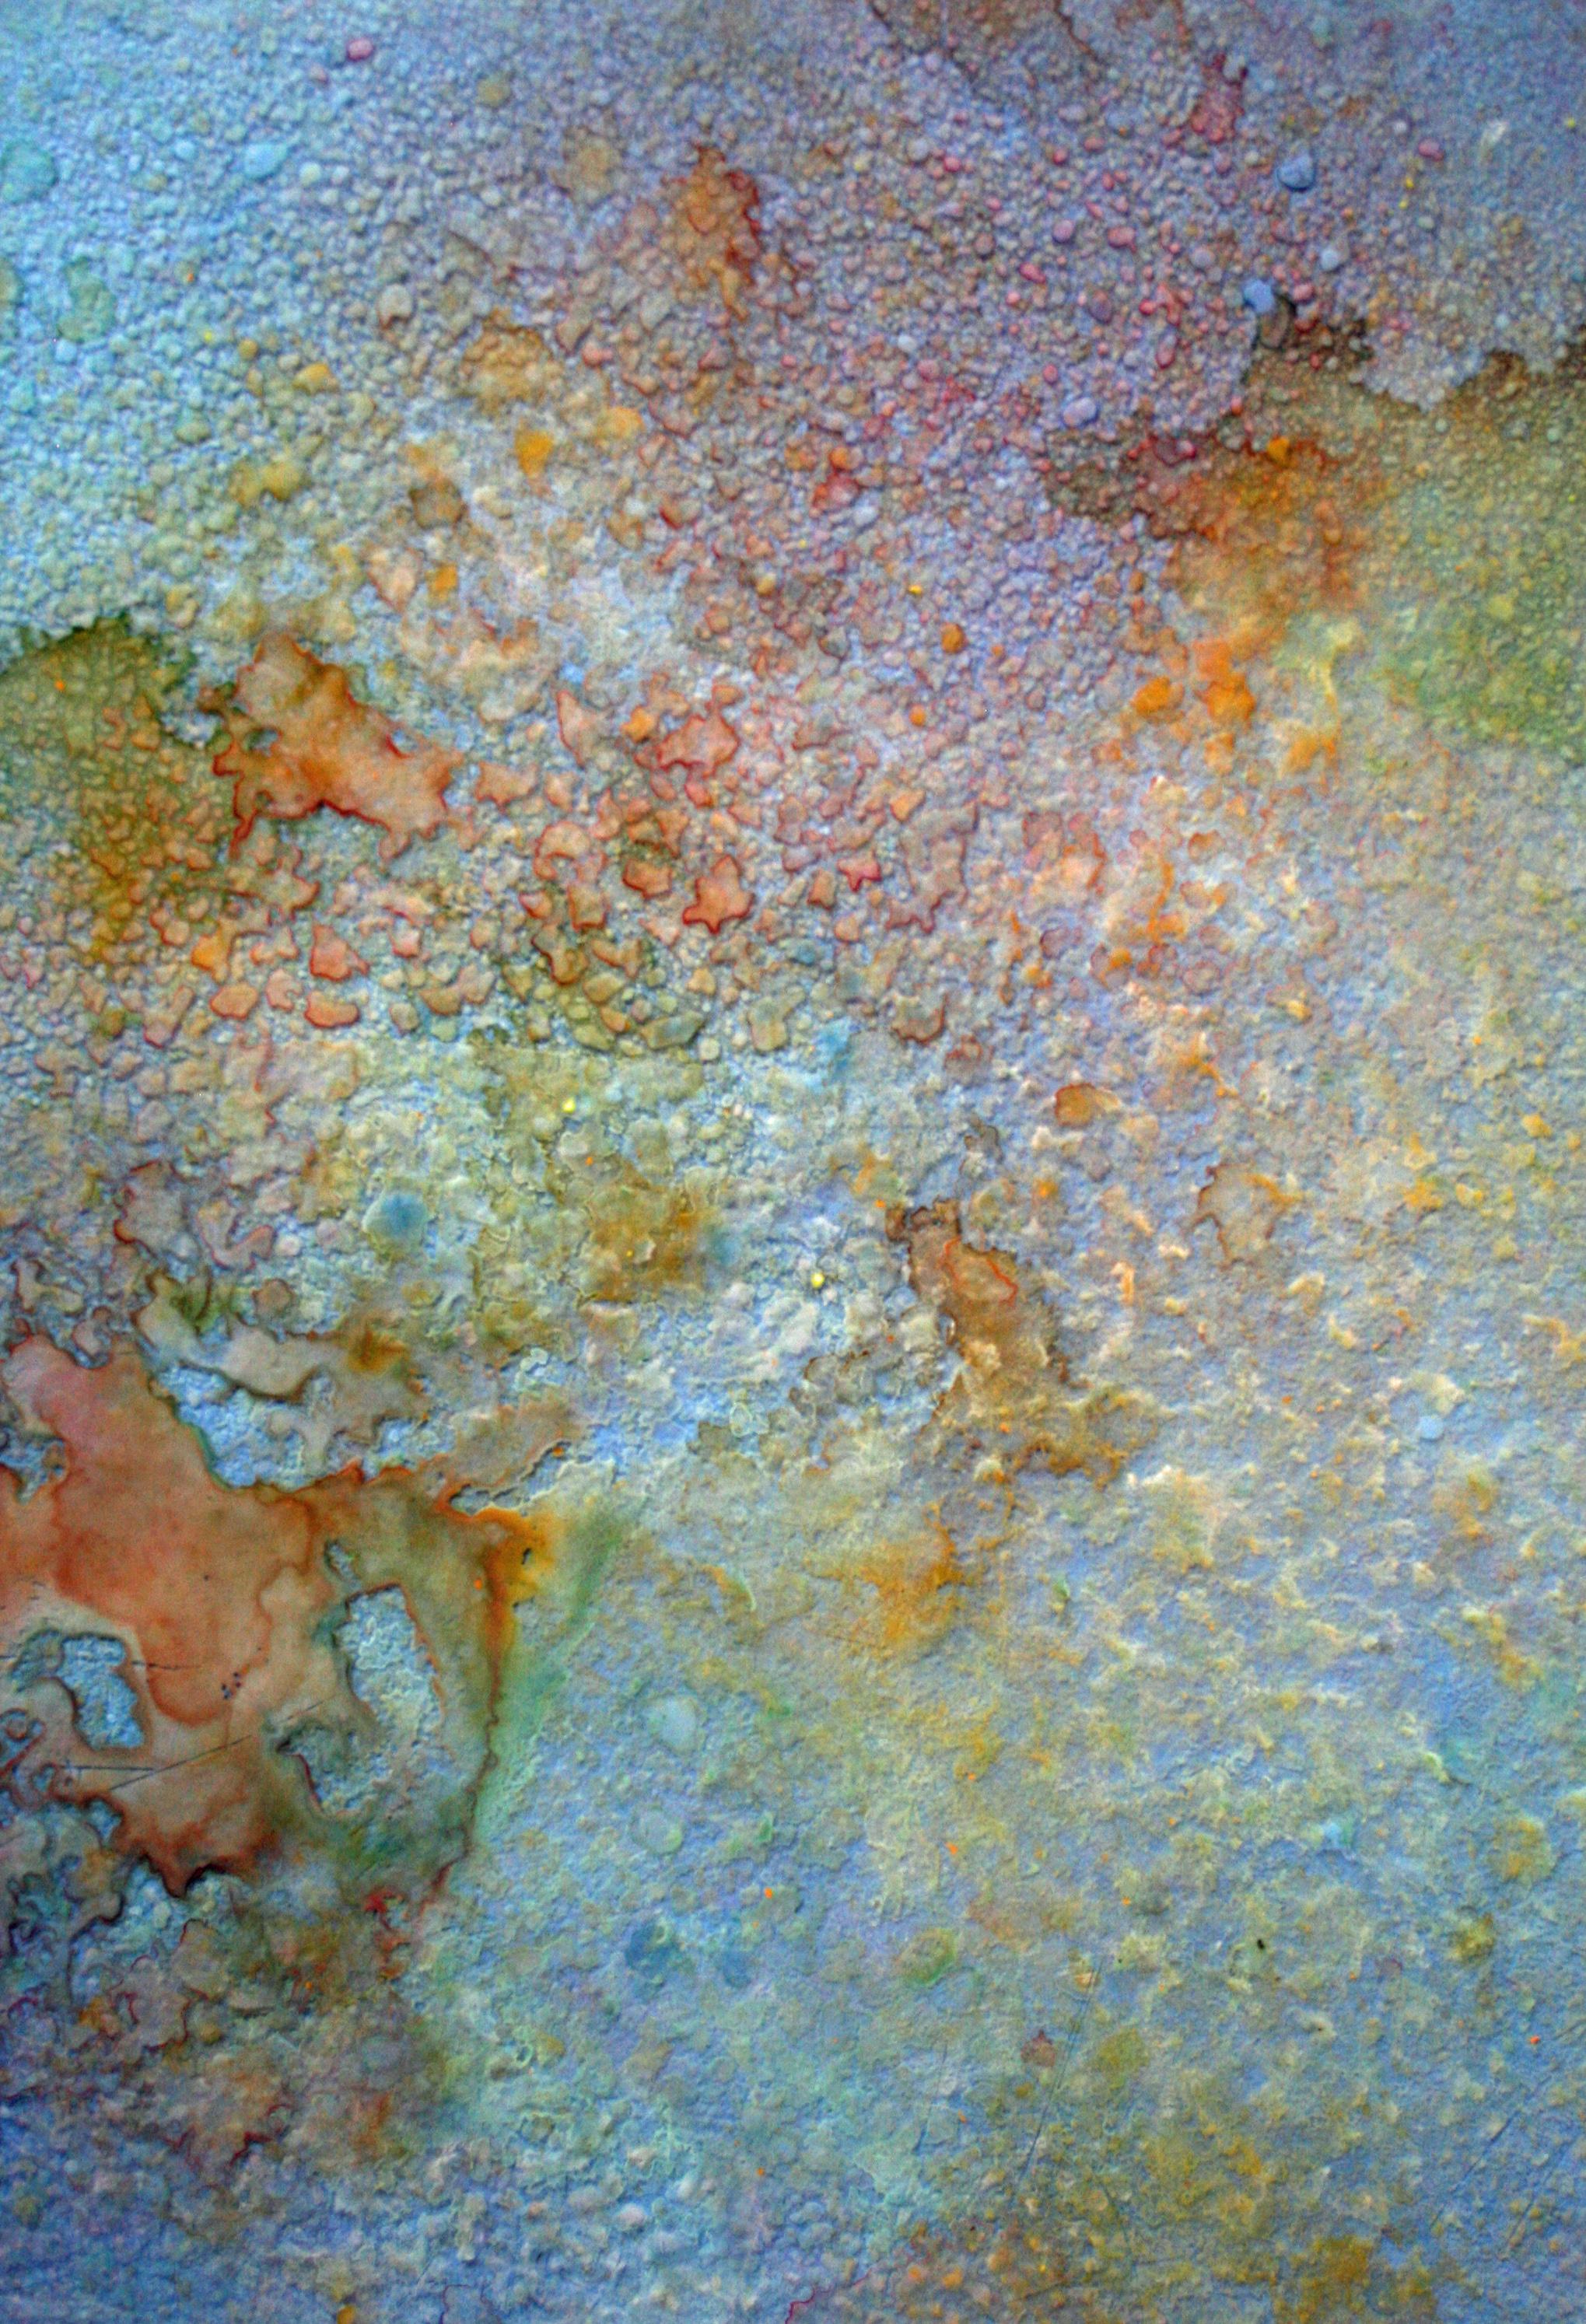 J. Warnock, Coral Series,4, Mixed Media, 300mm x 420mm (1).jpg